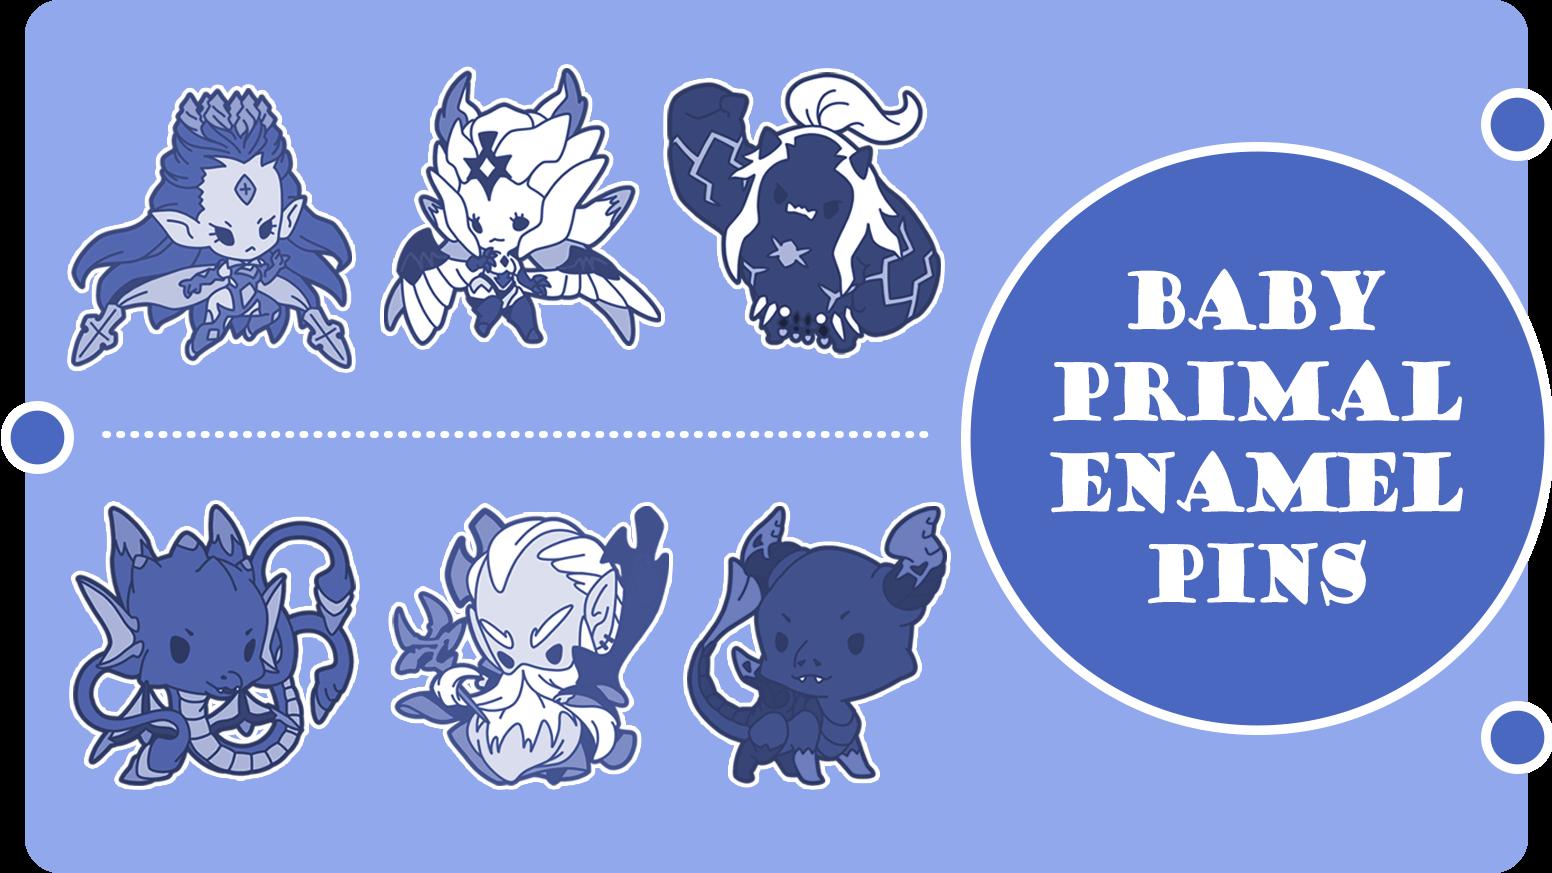 Final Fantasy XIV Baby Primal Enamel Pins by Maxx Merch